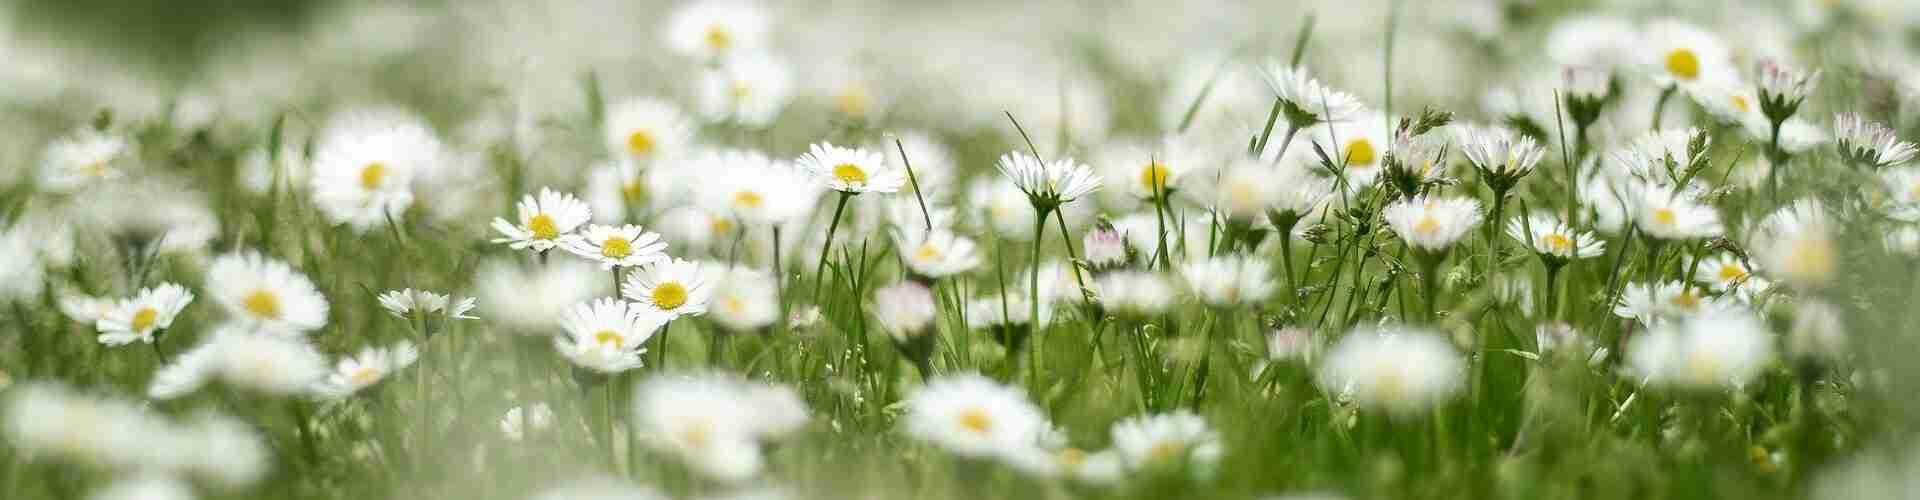 Gänseblümchen pflanzen